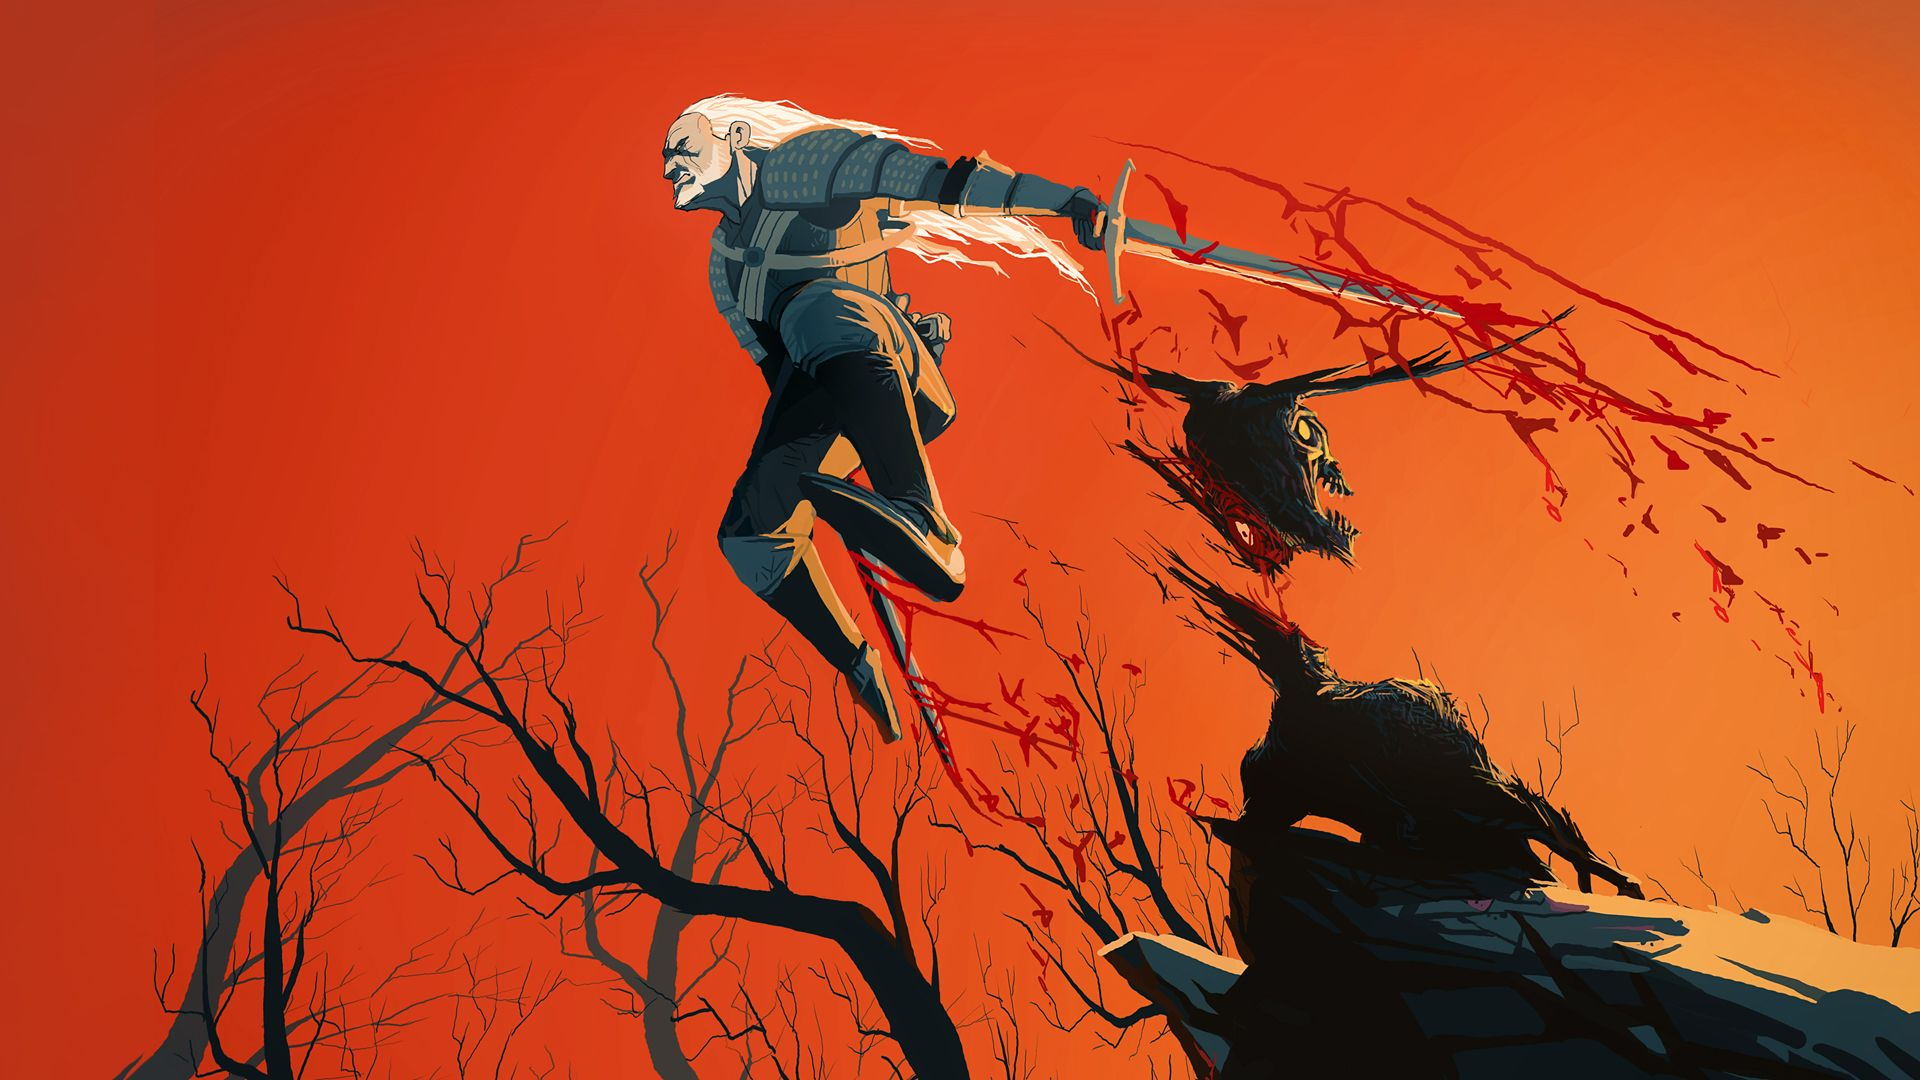 The Witcher Geralt Of Rivia Geralt Of Rivia Witcher Art The Witcher Geralt